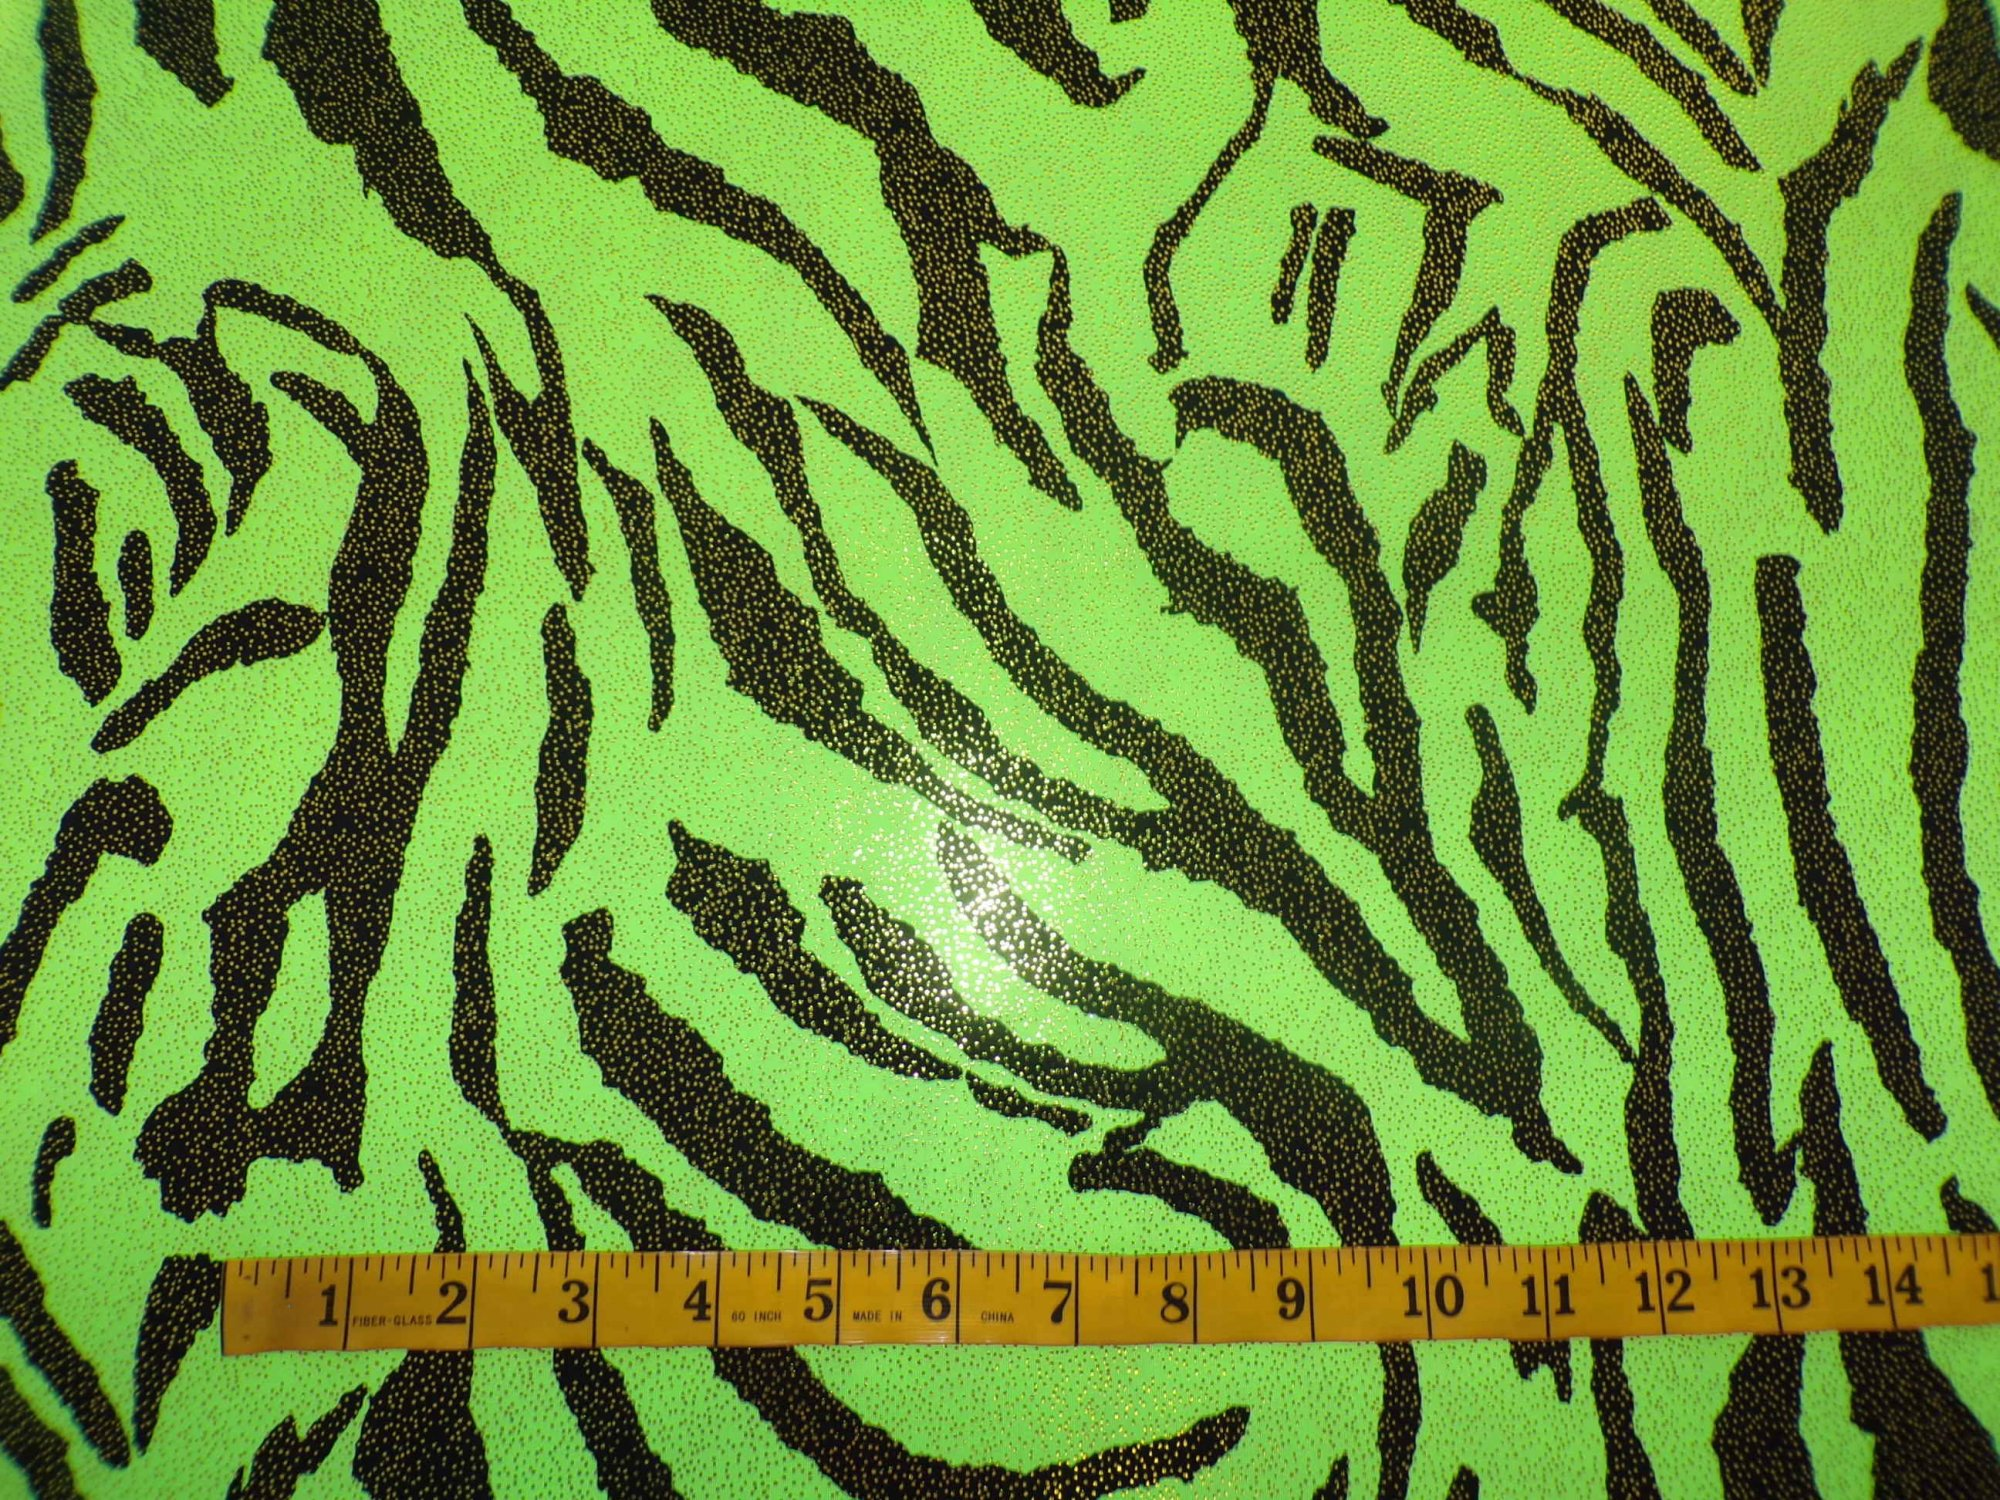 ITY Jersey - Neon Green and Black Zebra Stripes